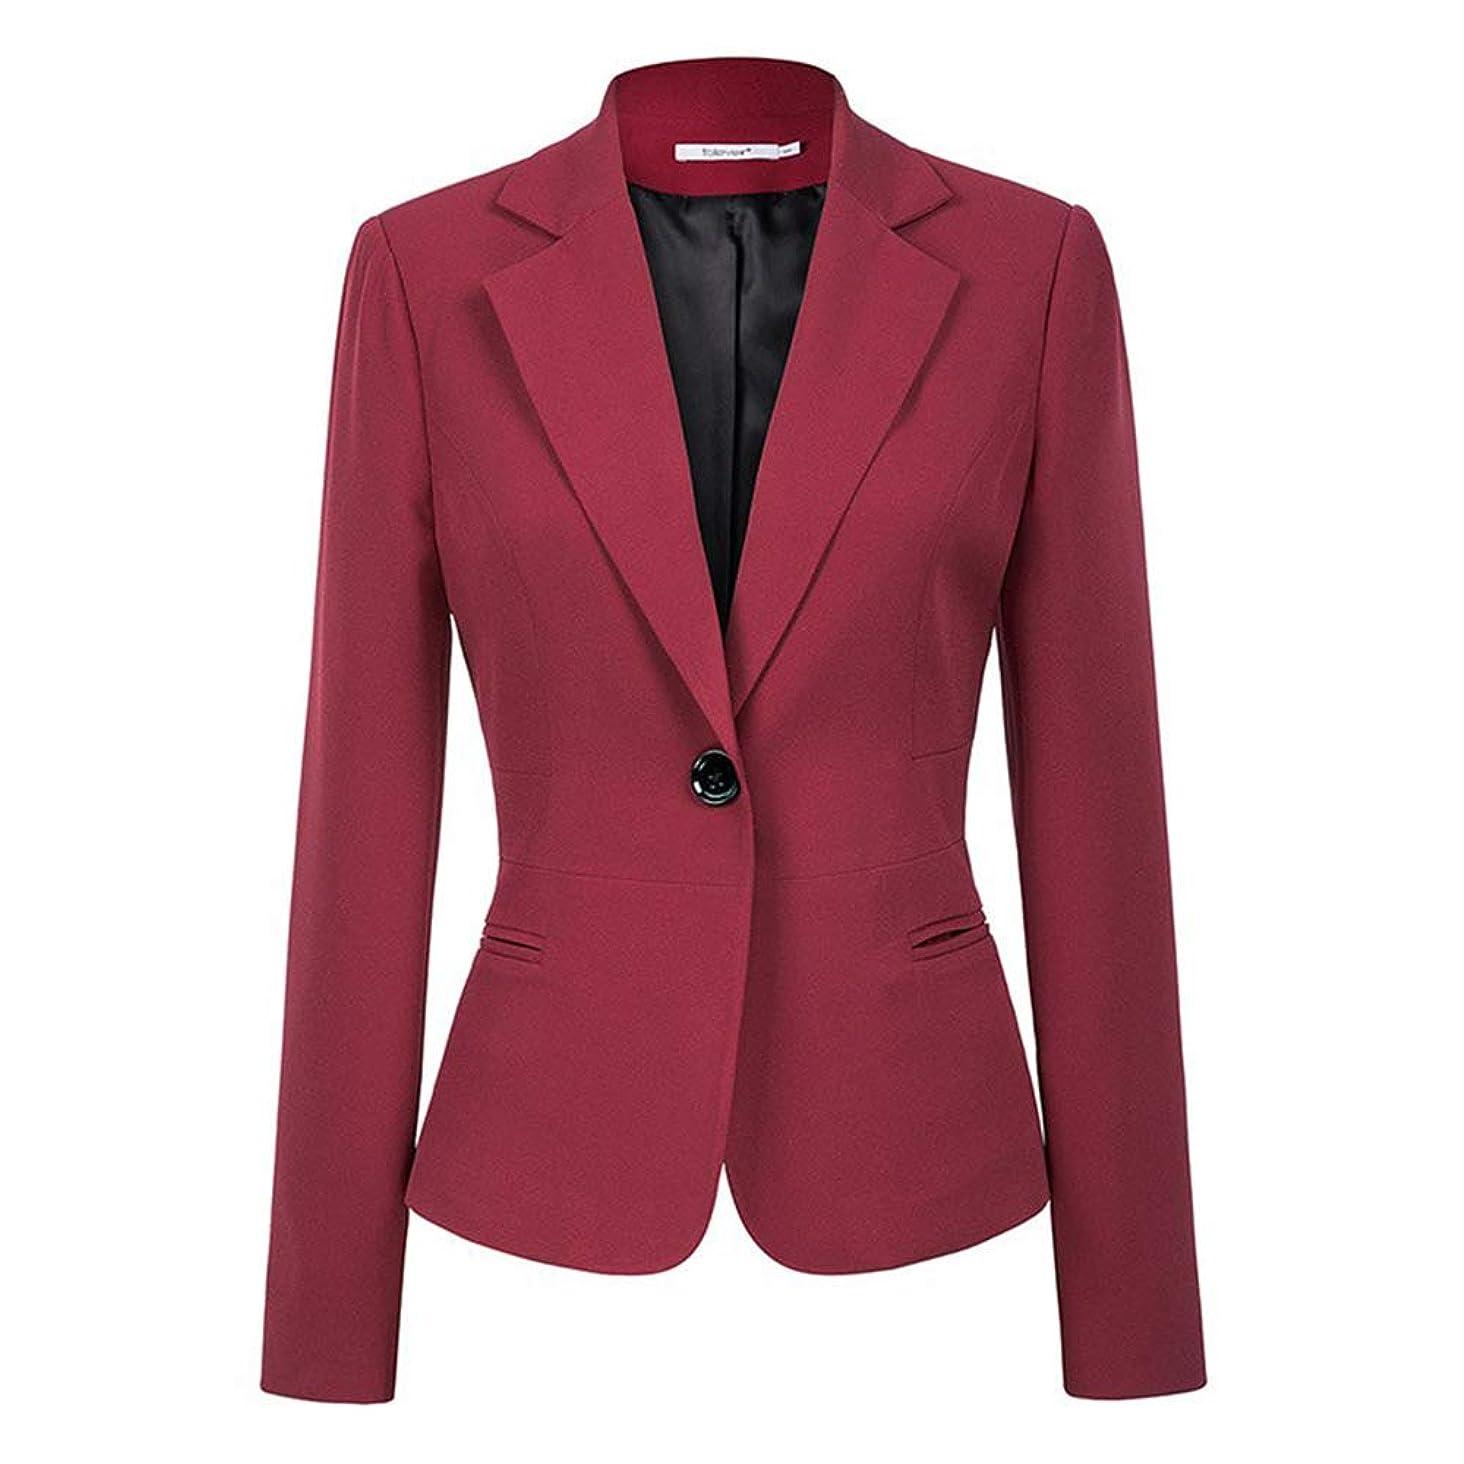 aoliaoyudongyongpin Jackets 2018 Fashion Single Button Blazer Femenino Office Ladies Blazer Coat Zevrez